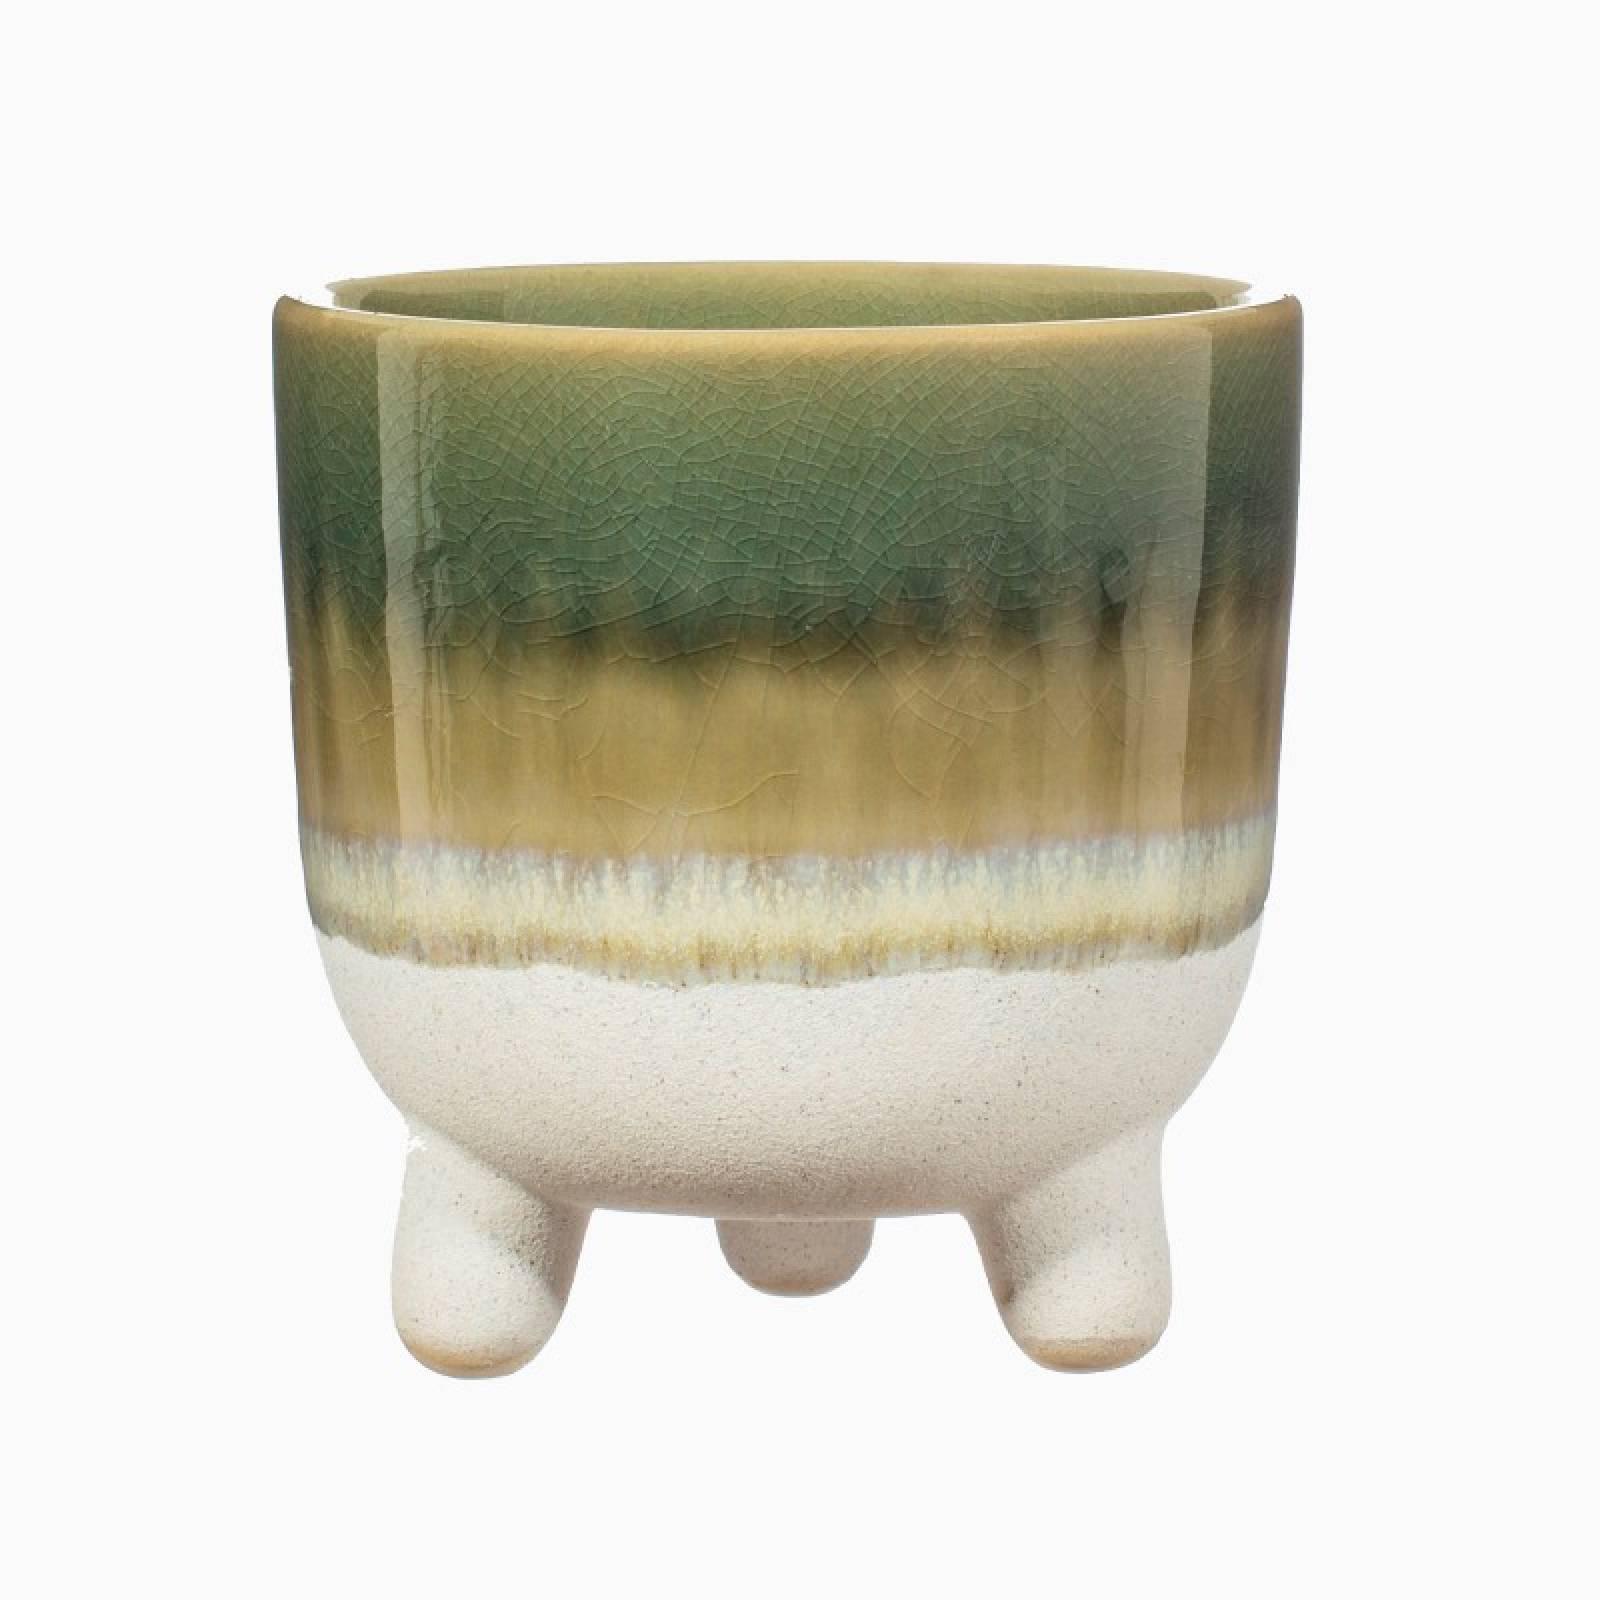 Two Tone Dip Glazed Stoneware Plant Pot In Green thumbnails